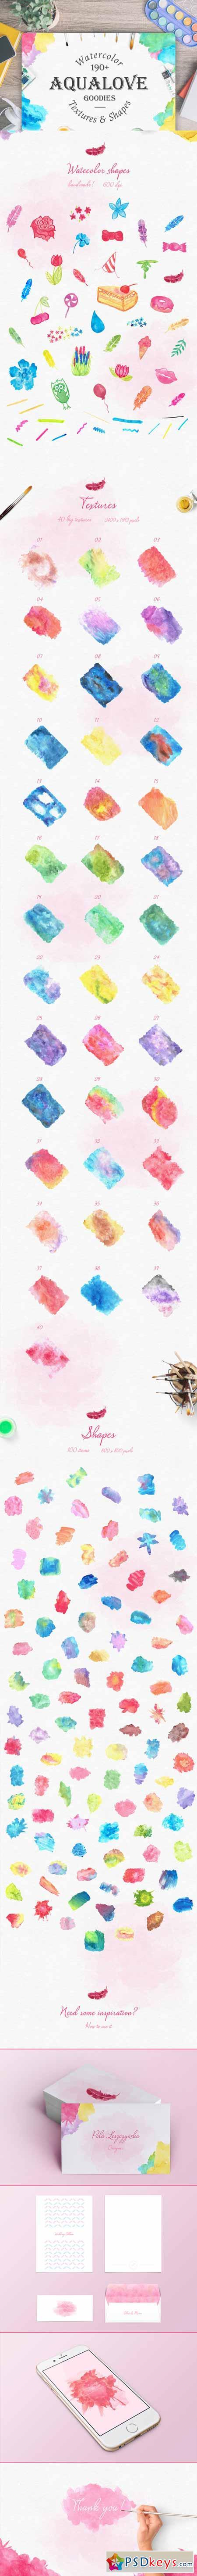 Aqualove - Watercolor Goodies 323654